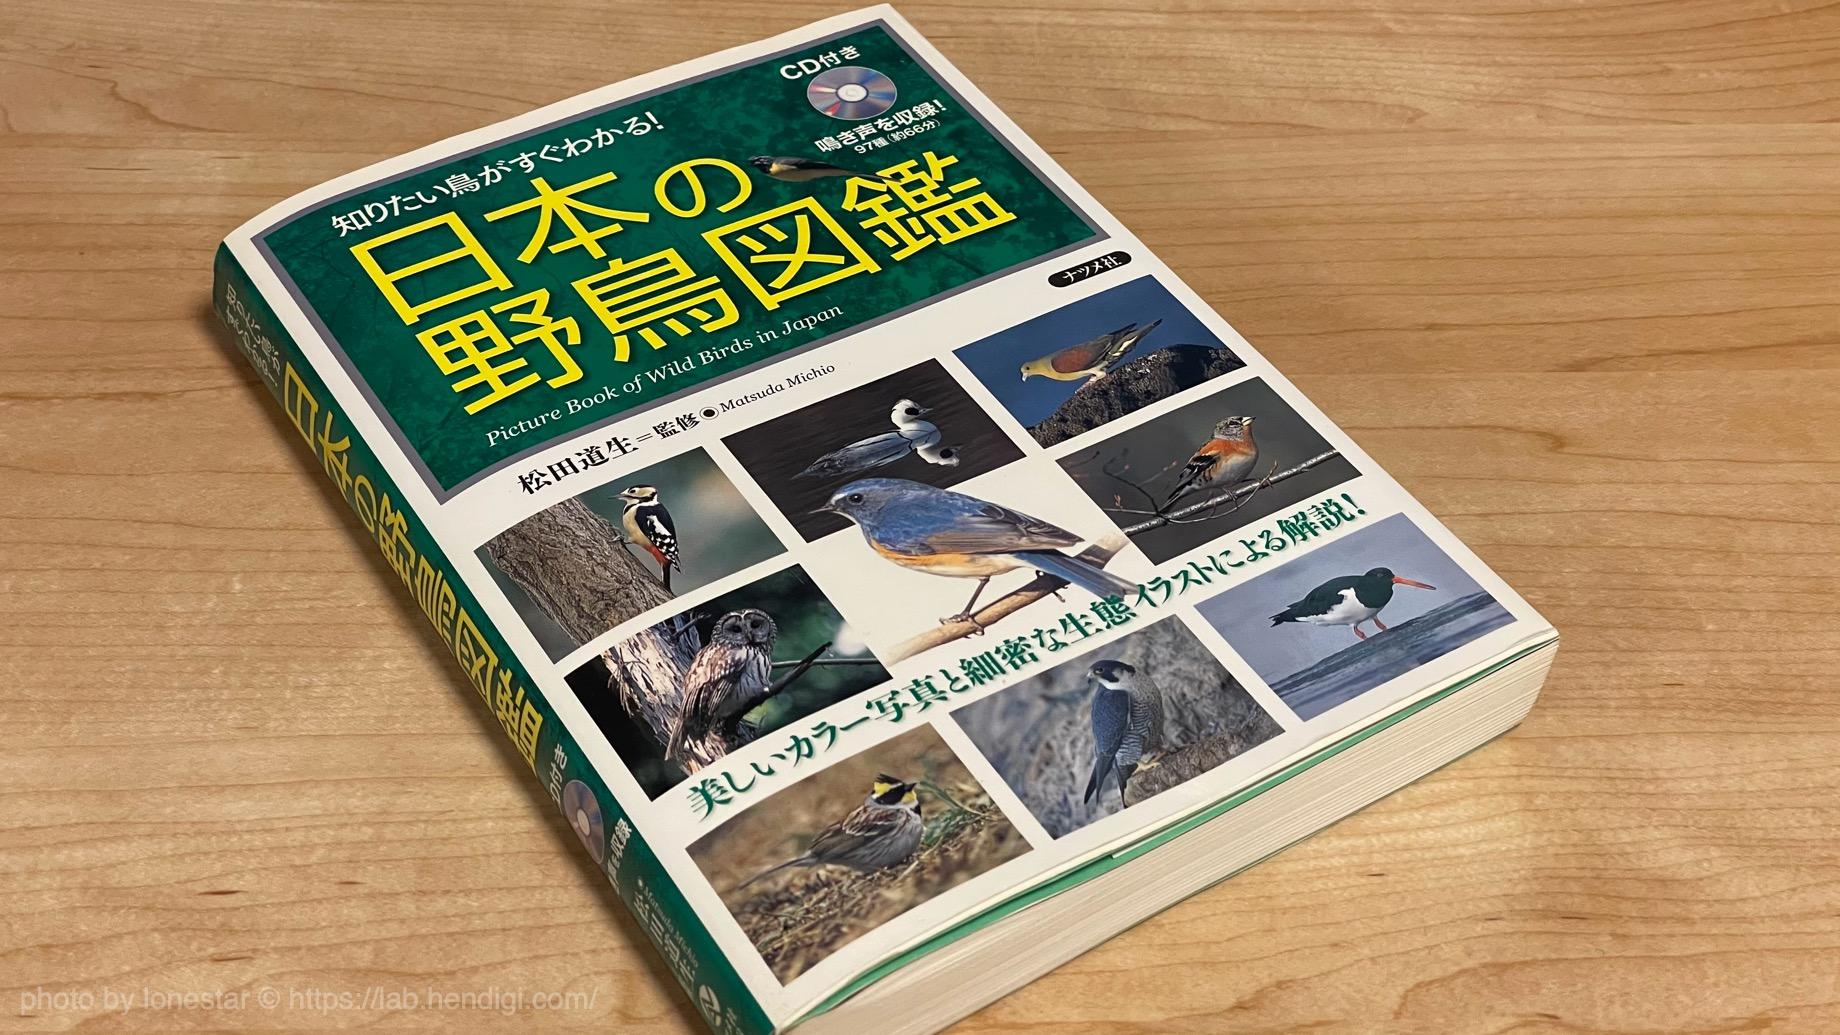 野鳥 名前 調べ方